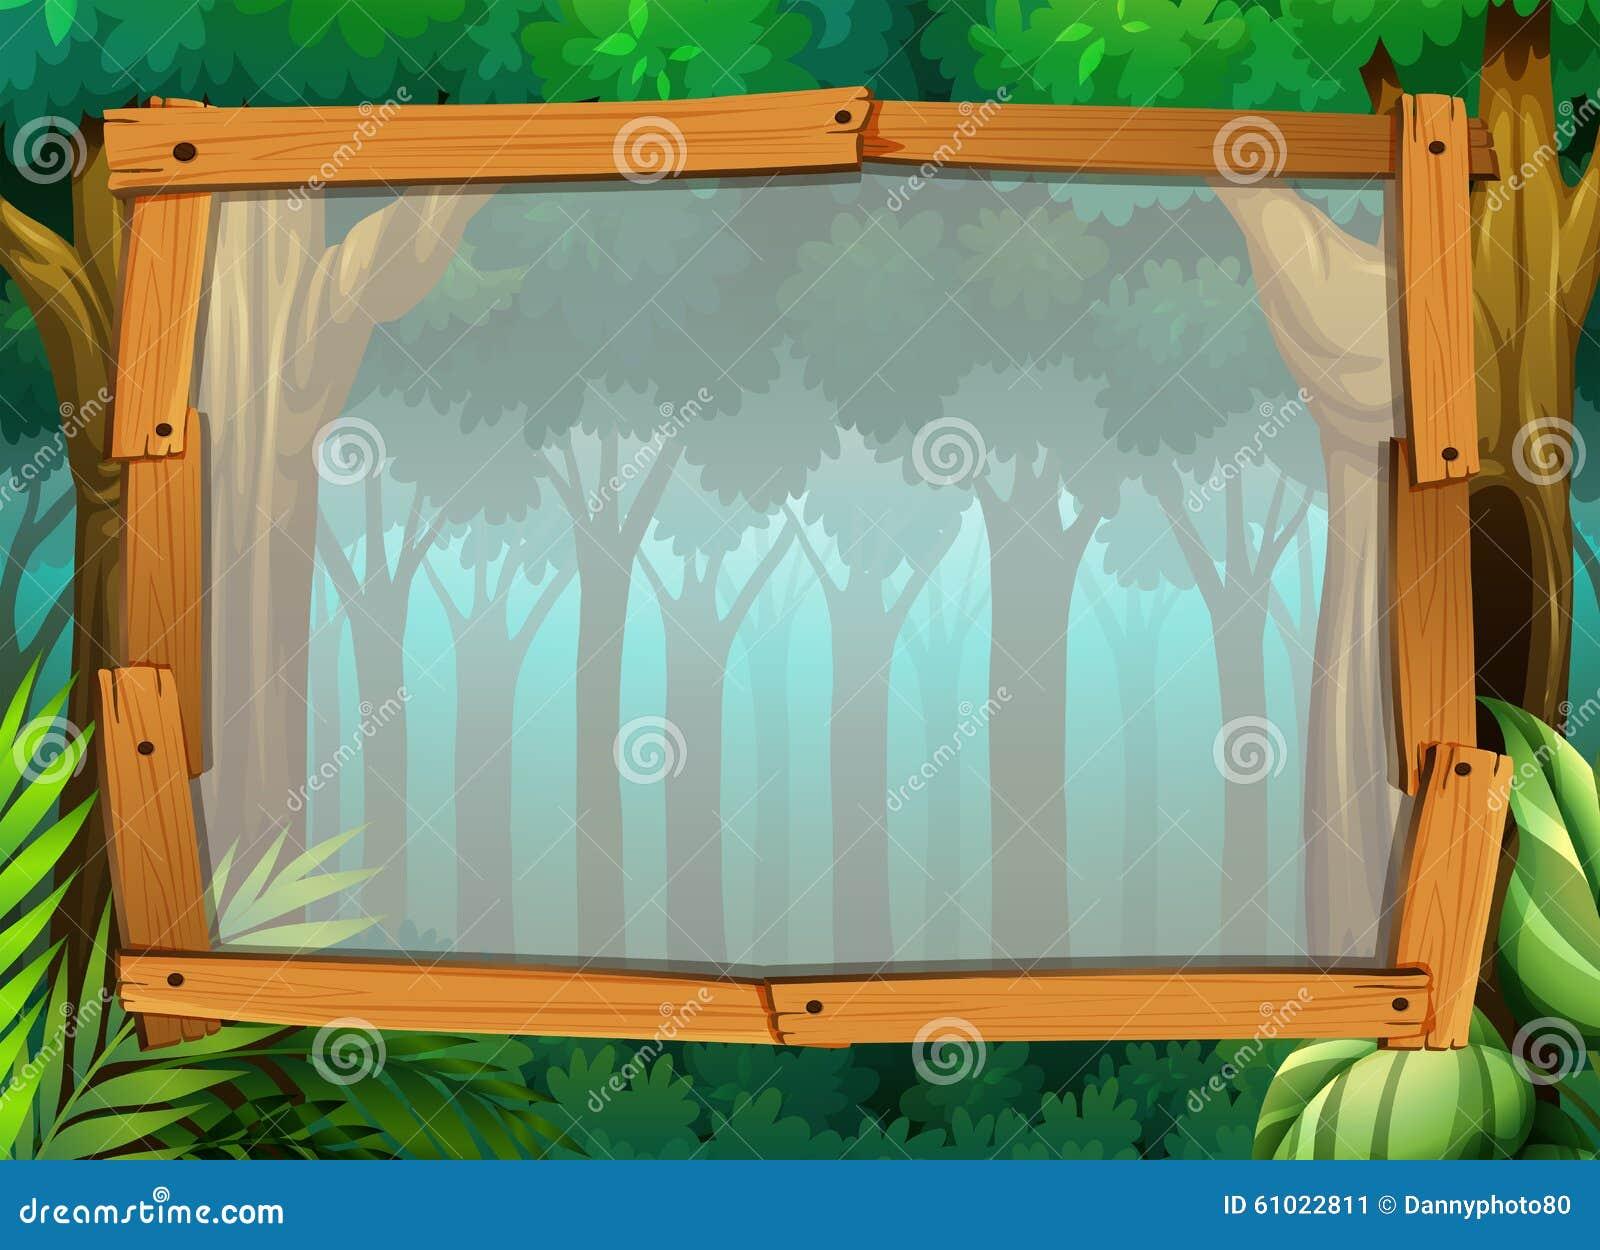 Border Design With Dark Forest Stock Vector - Illustration ...